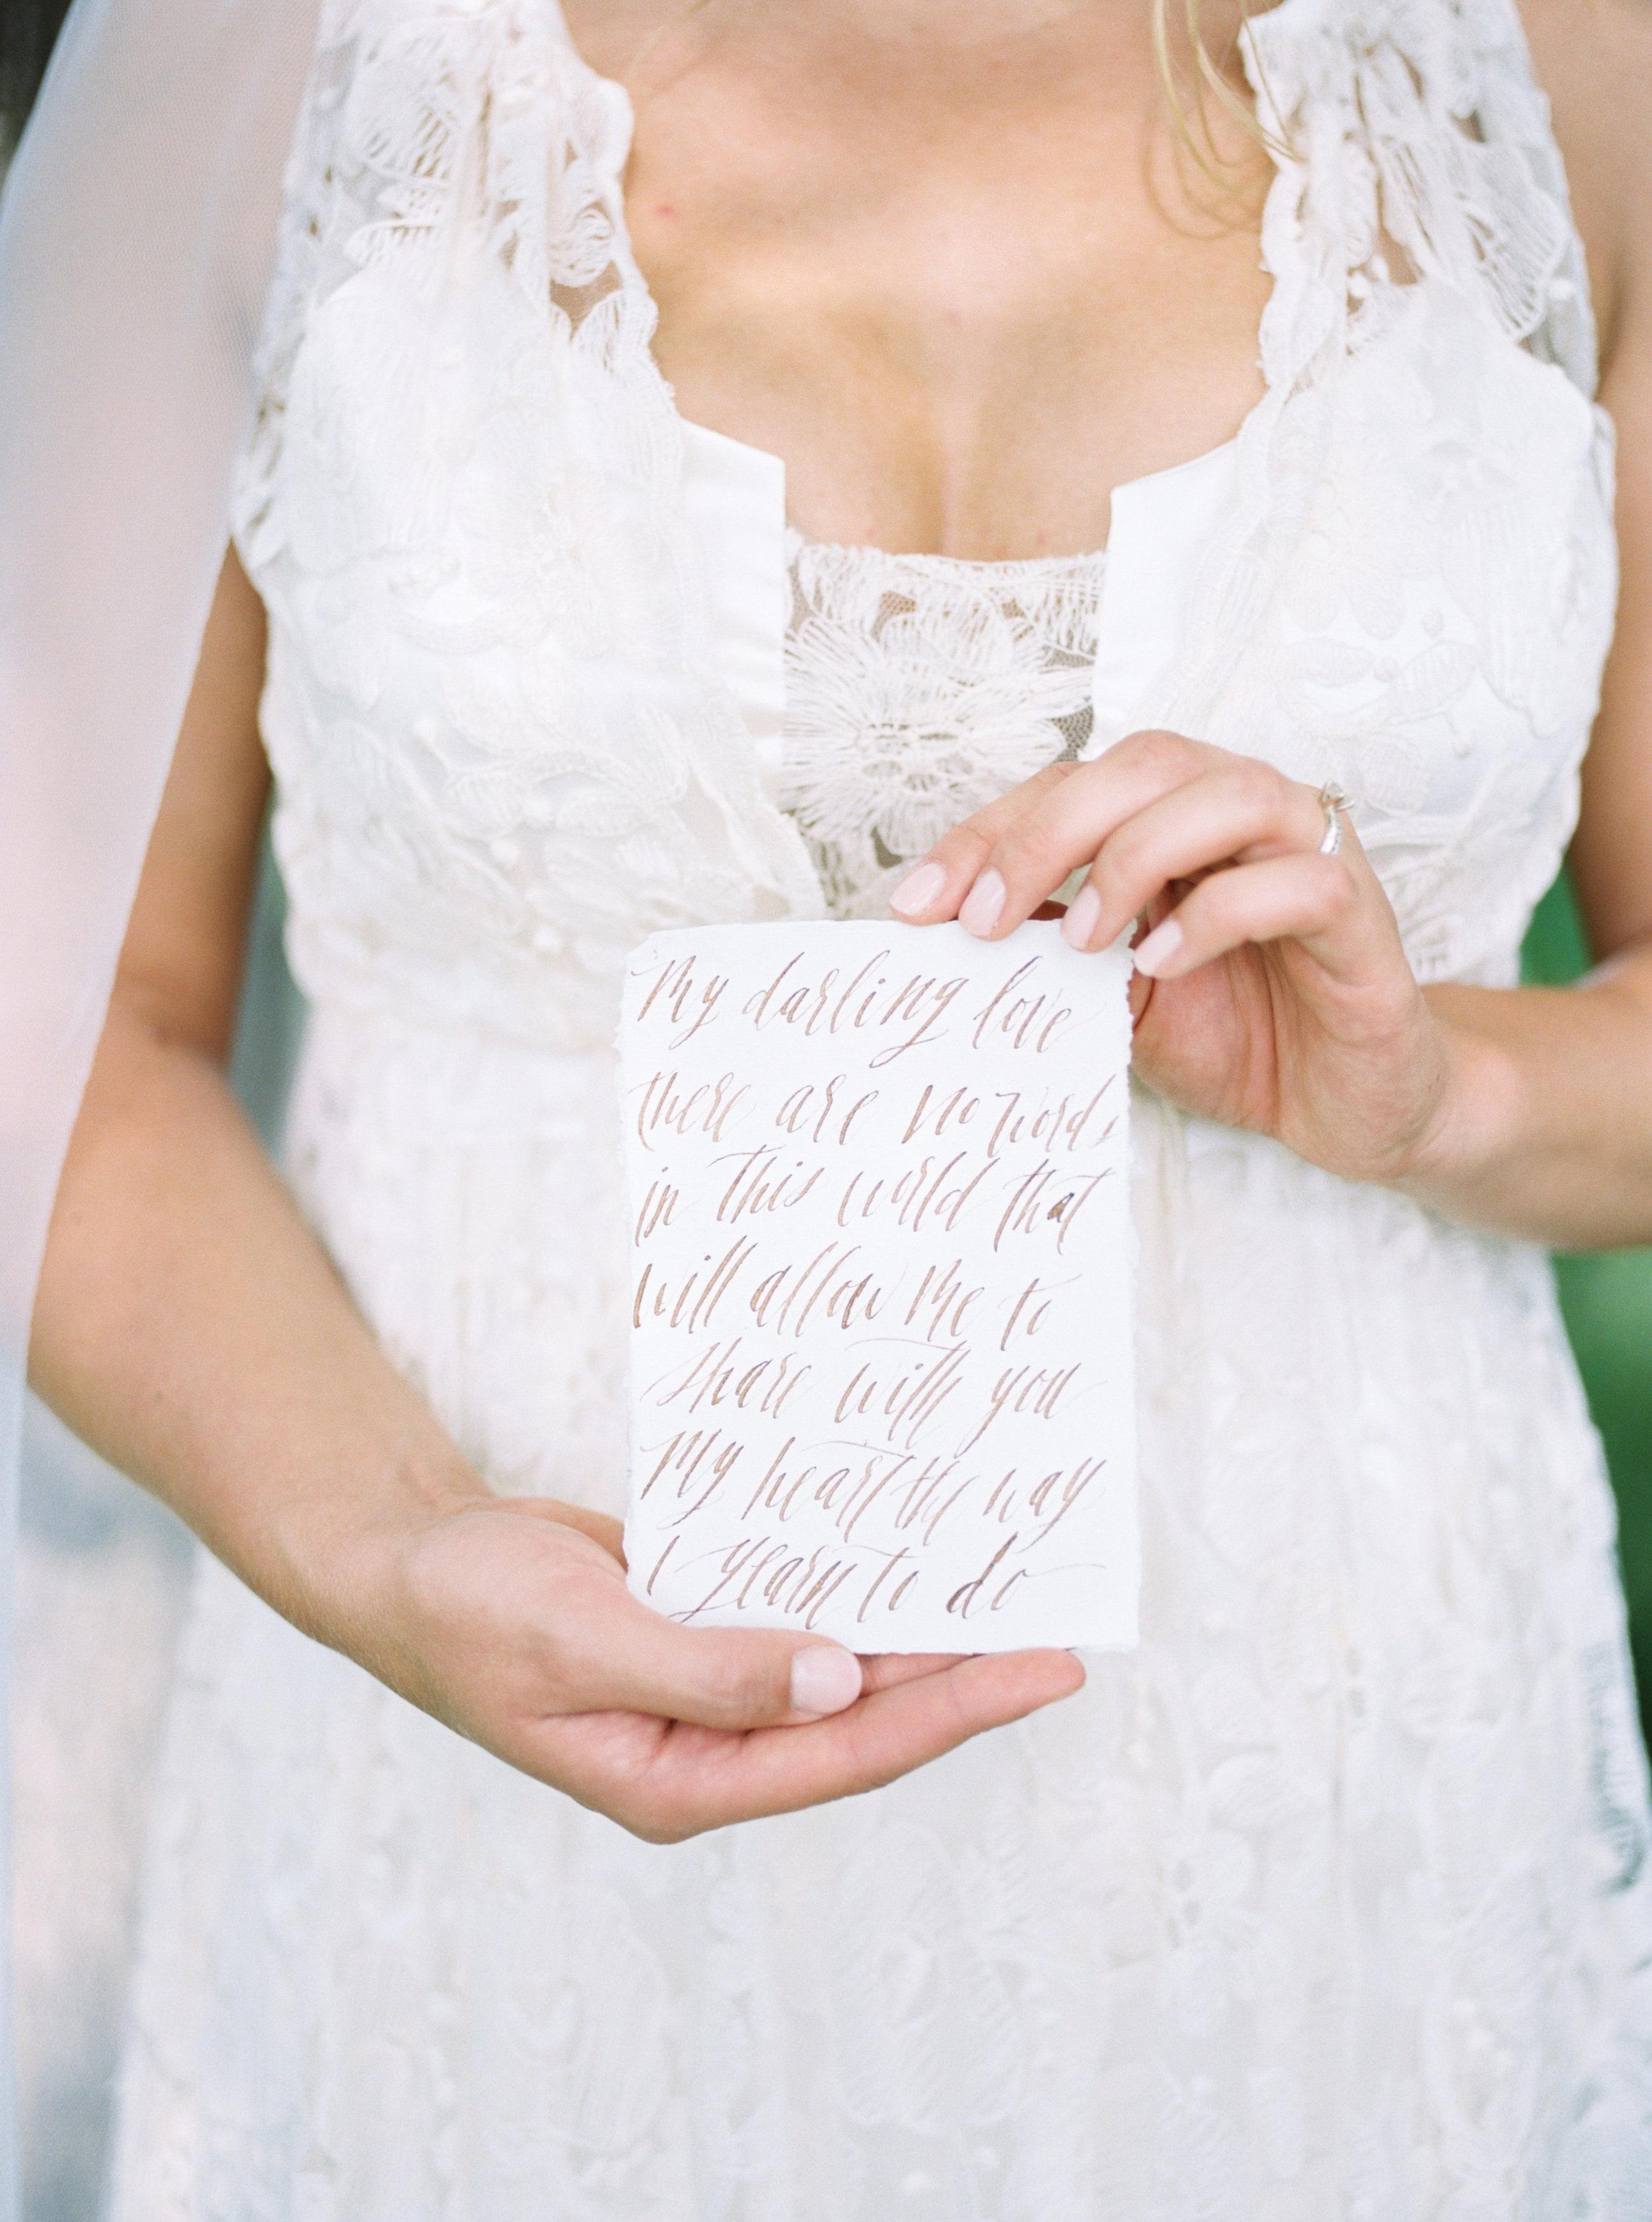 greenhouse-wedding-inspiration-by-laurelyn-savannah-photography-119.jpg